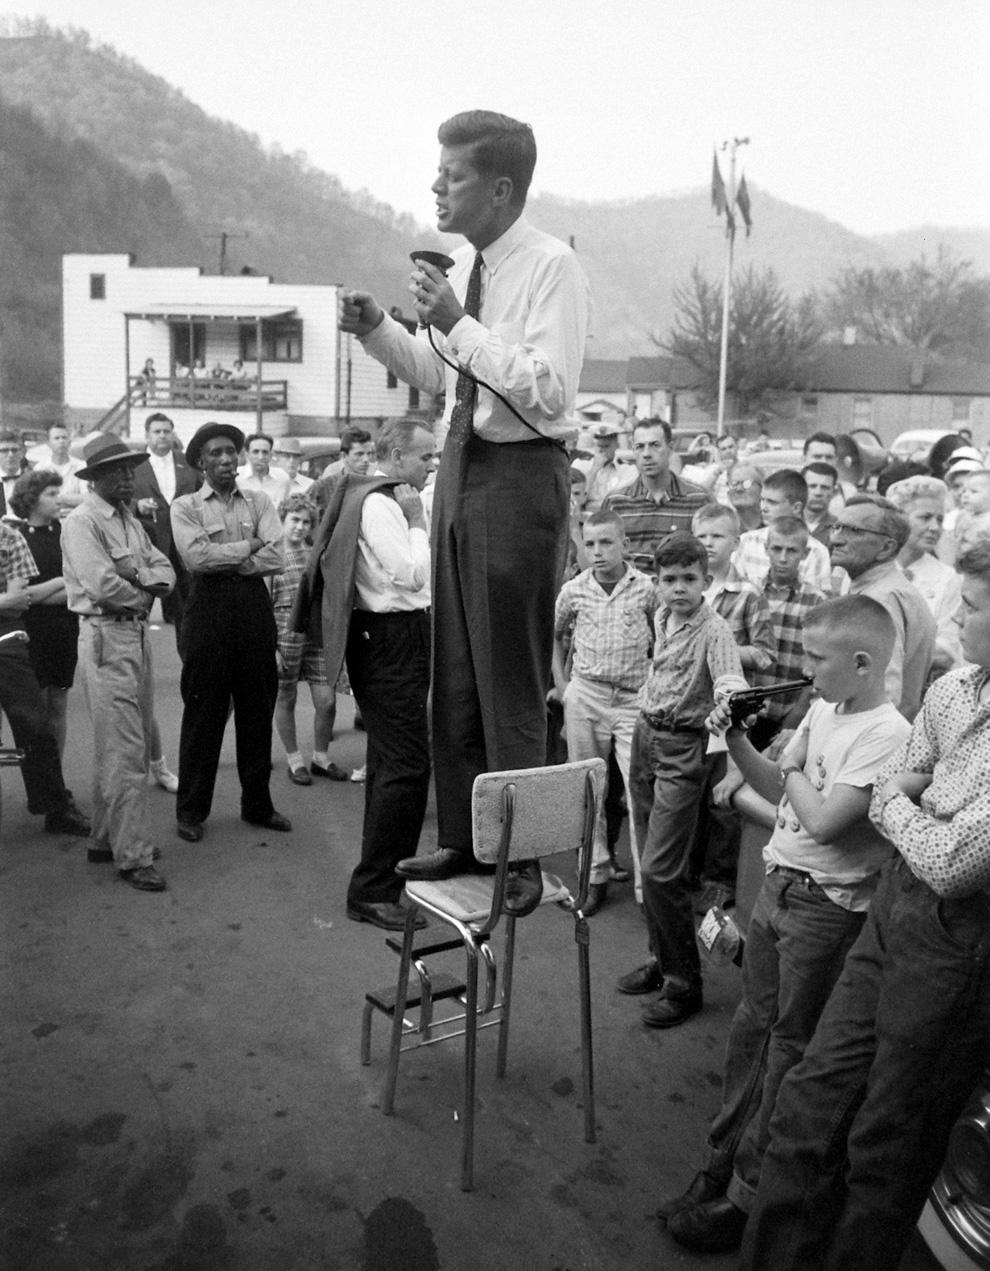 JFK on kitchen stool addressing crowd